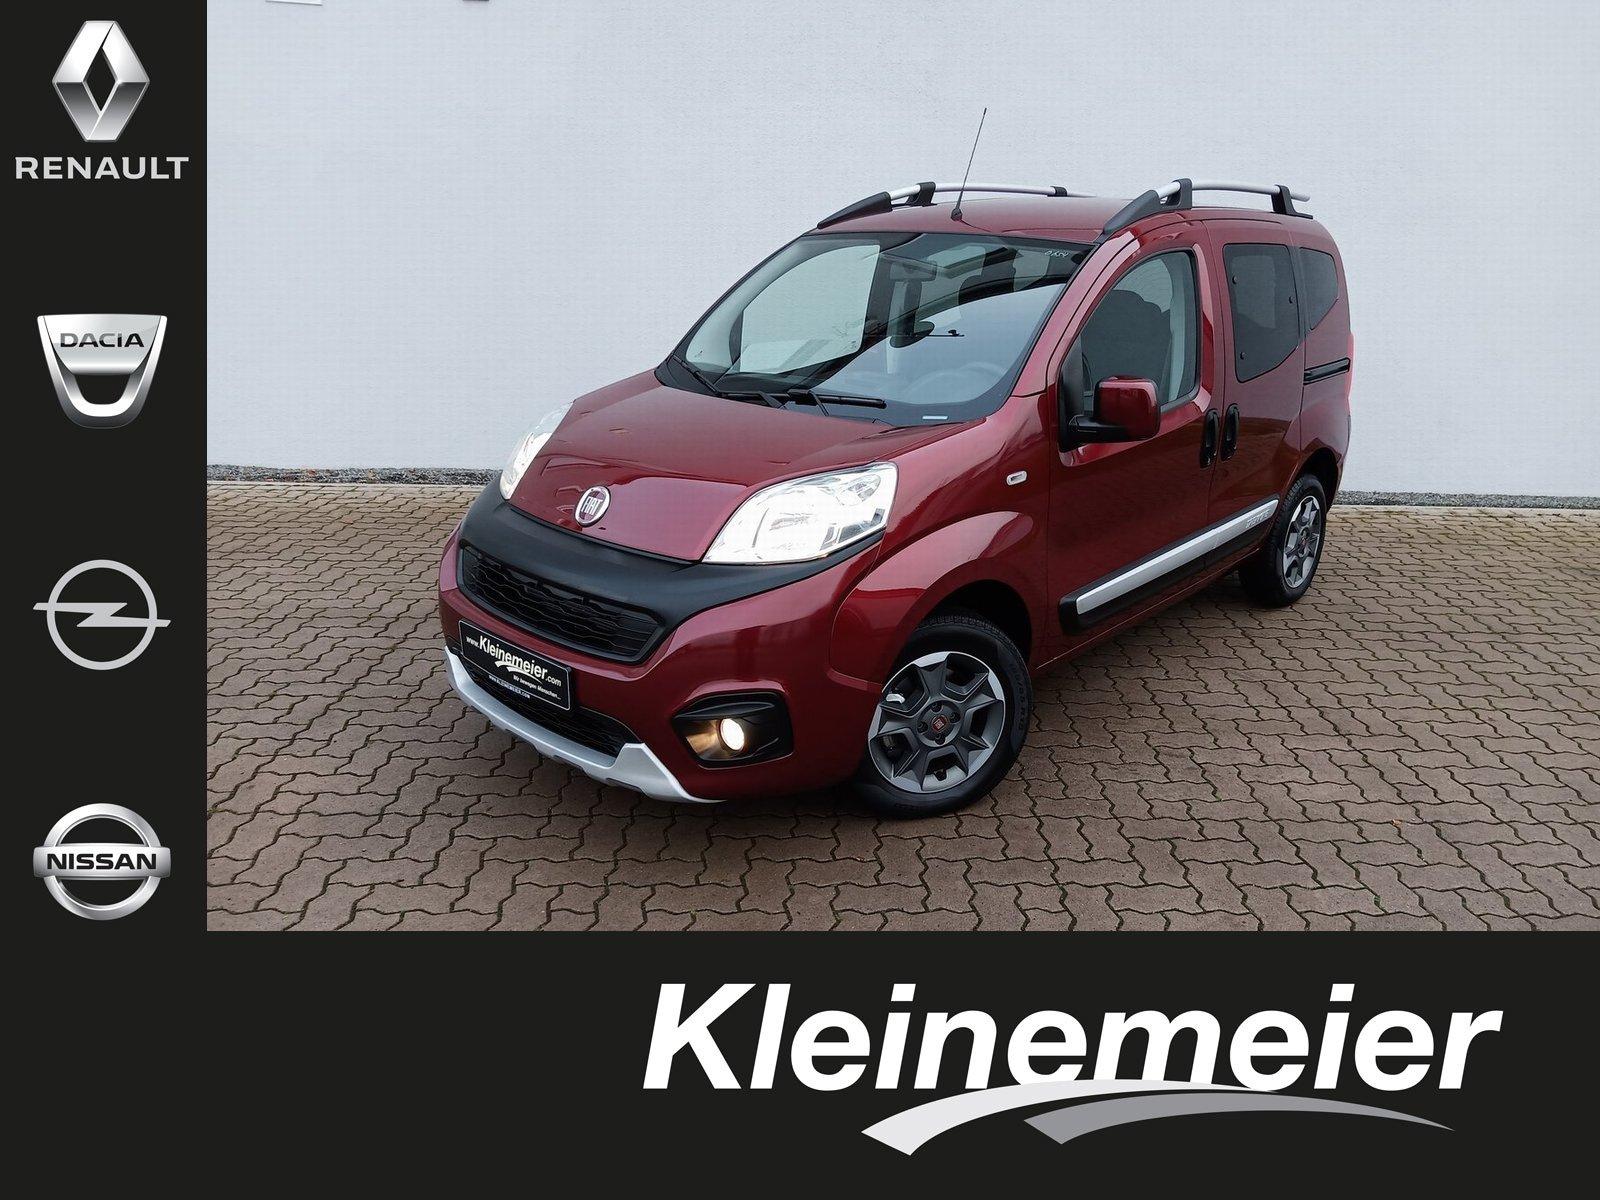 Fiat Qubo 1.3 Multijet 16V Trekking*AHK*Navi*SZH*PDC*, Jahr 2019, Diesel